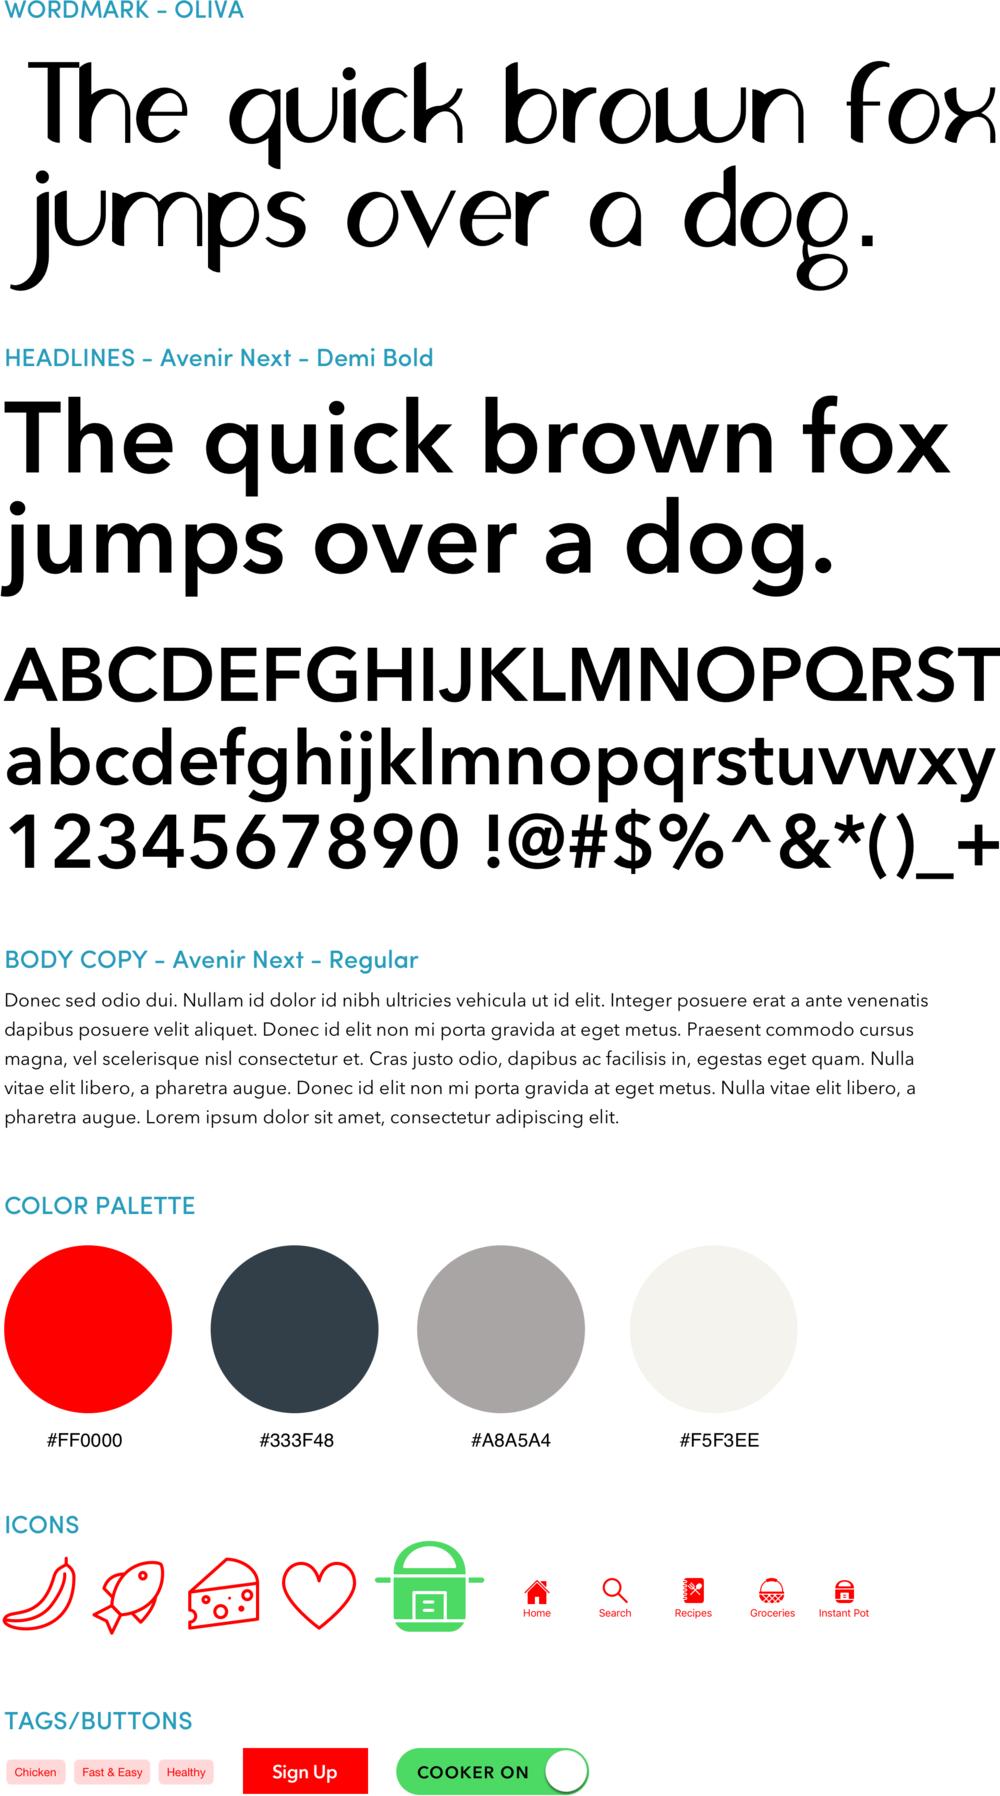 visual-design-toolkit.png